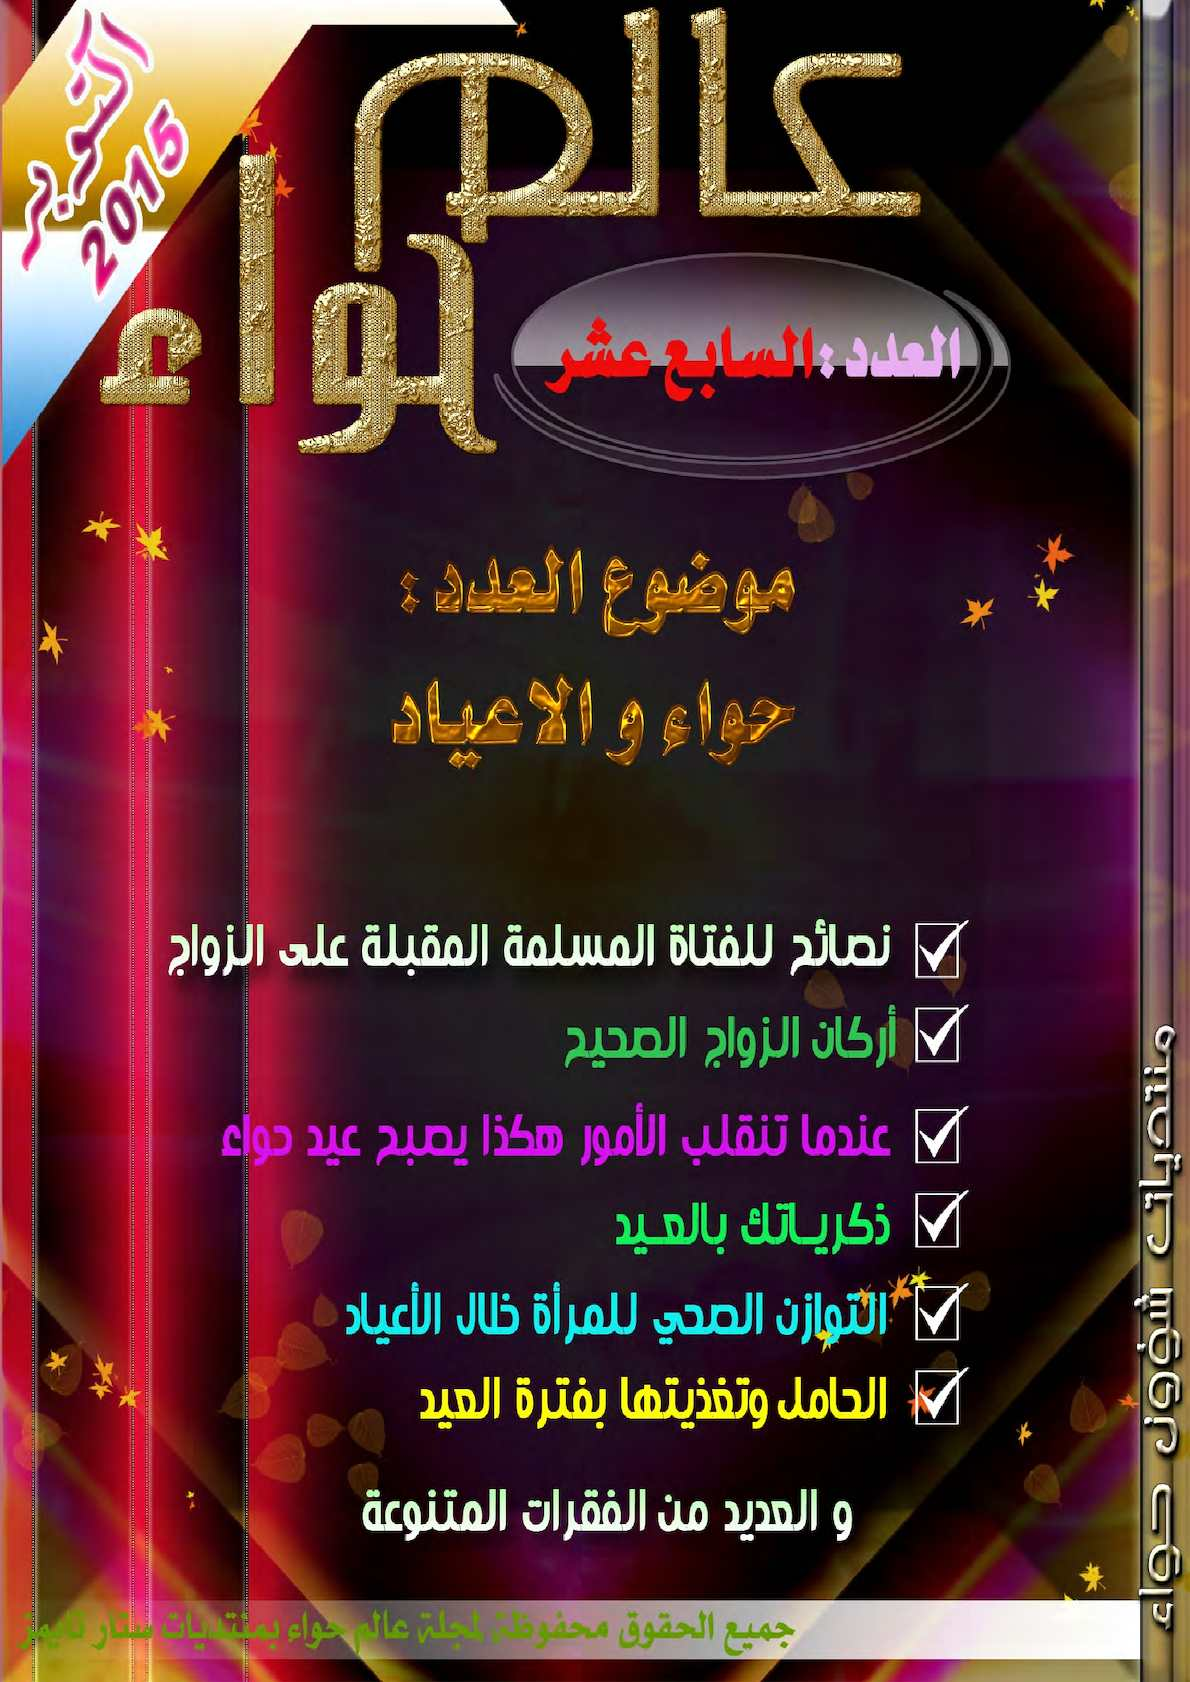 67a3408ff7a68 عالم حواء 17 Saabdel - CALAMEO Downloader